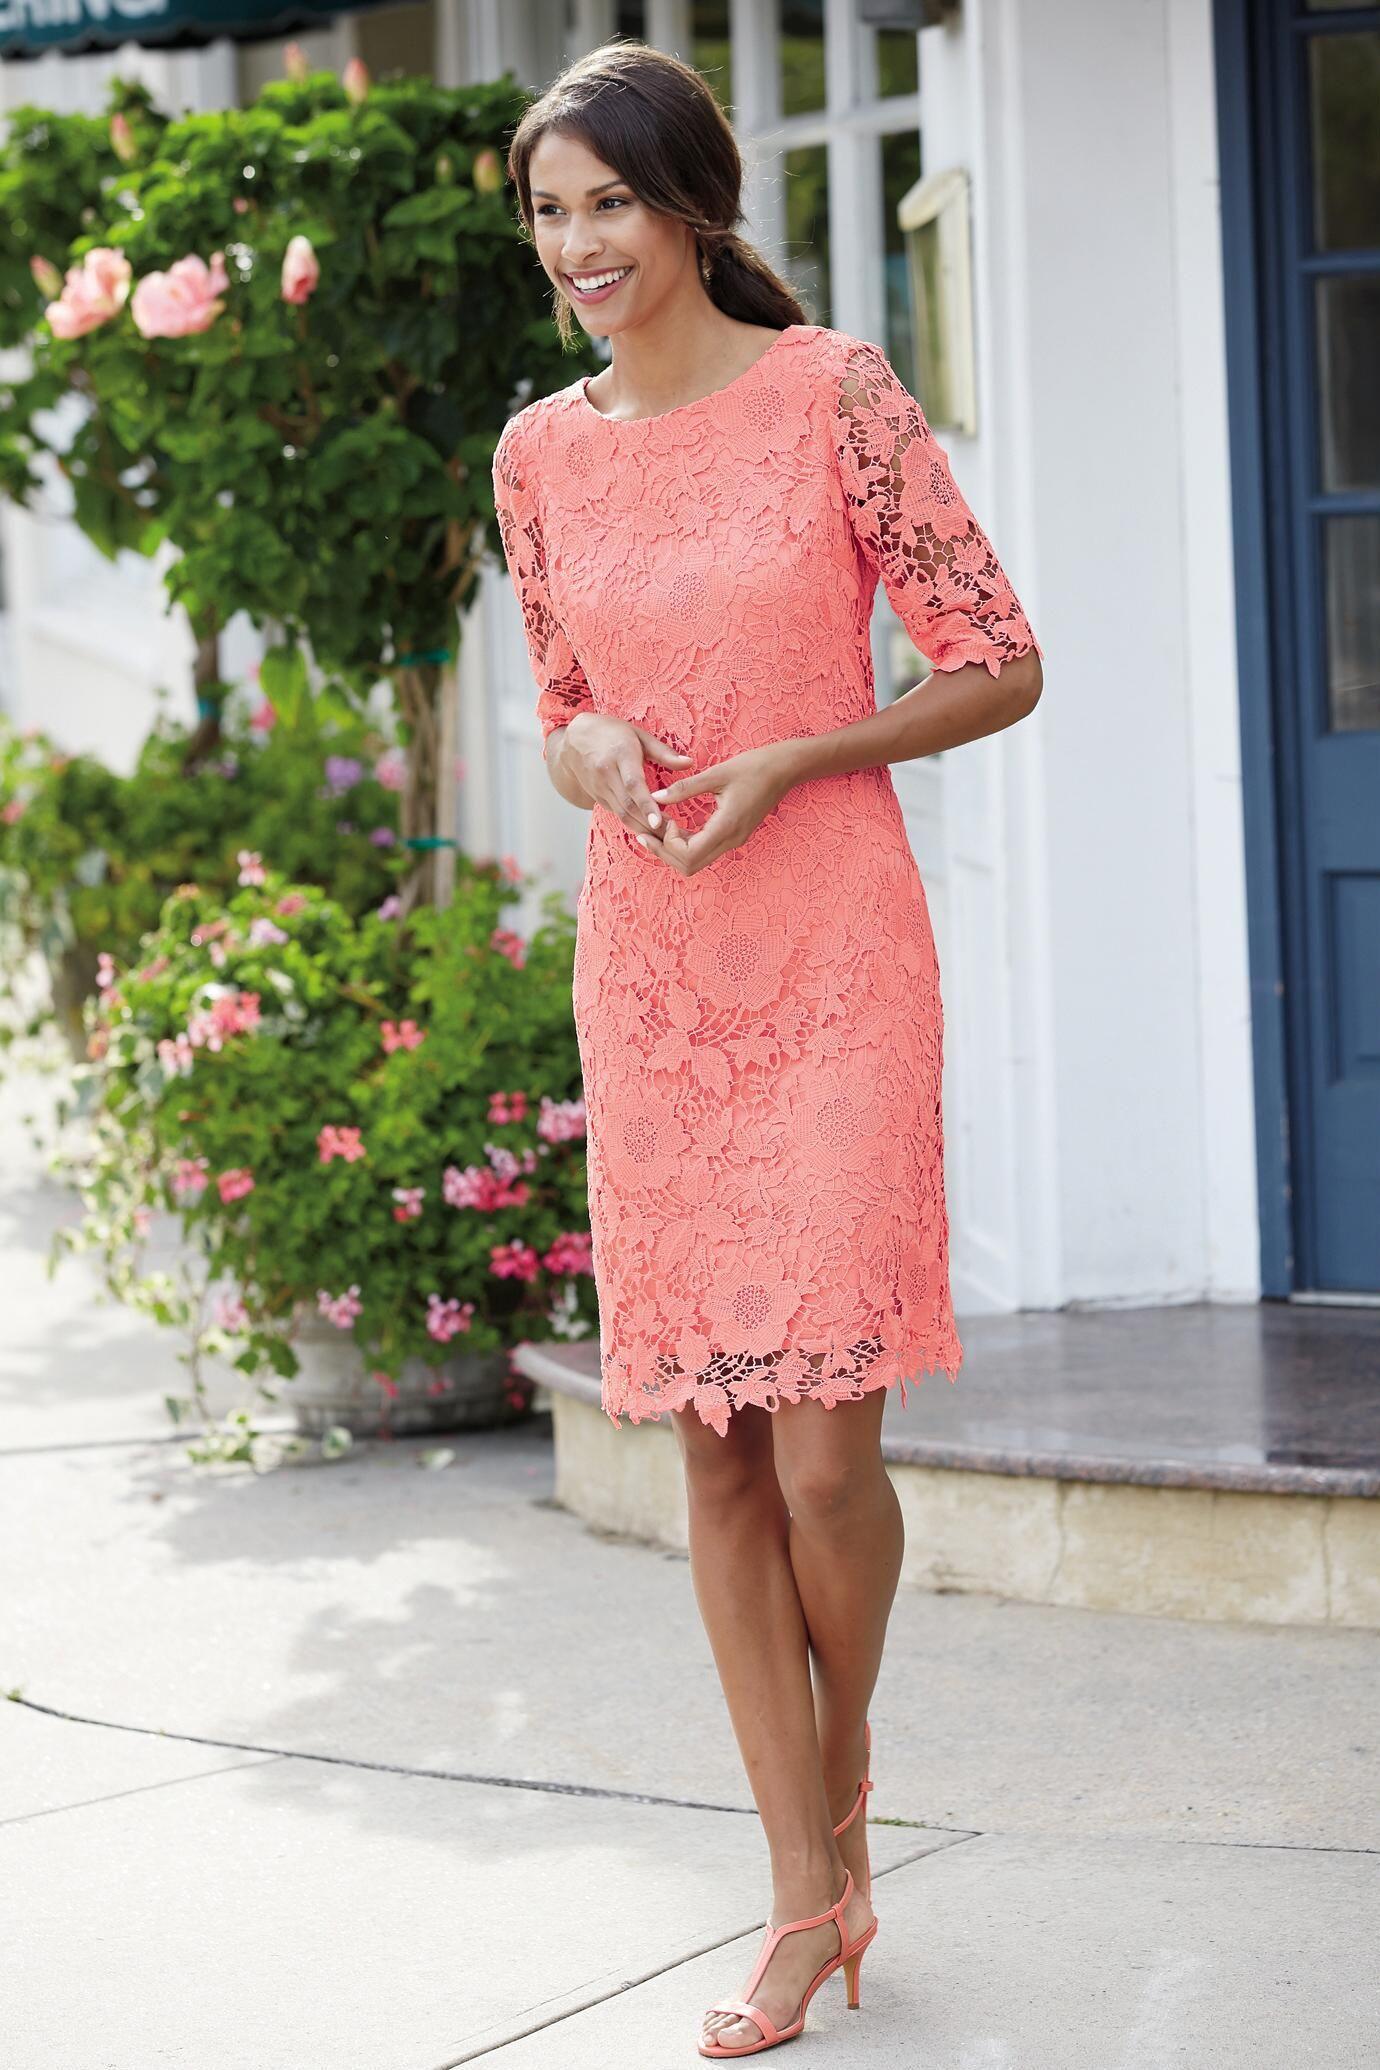 Short Sleeve Lace Overlay Dress | Pinterest | Bonito y Ropa